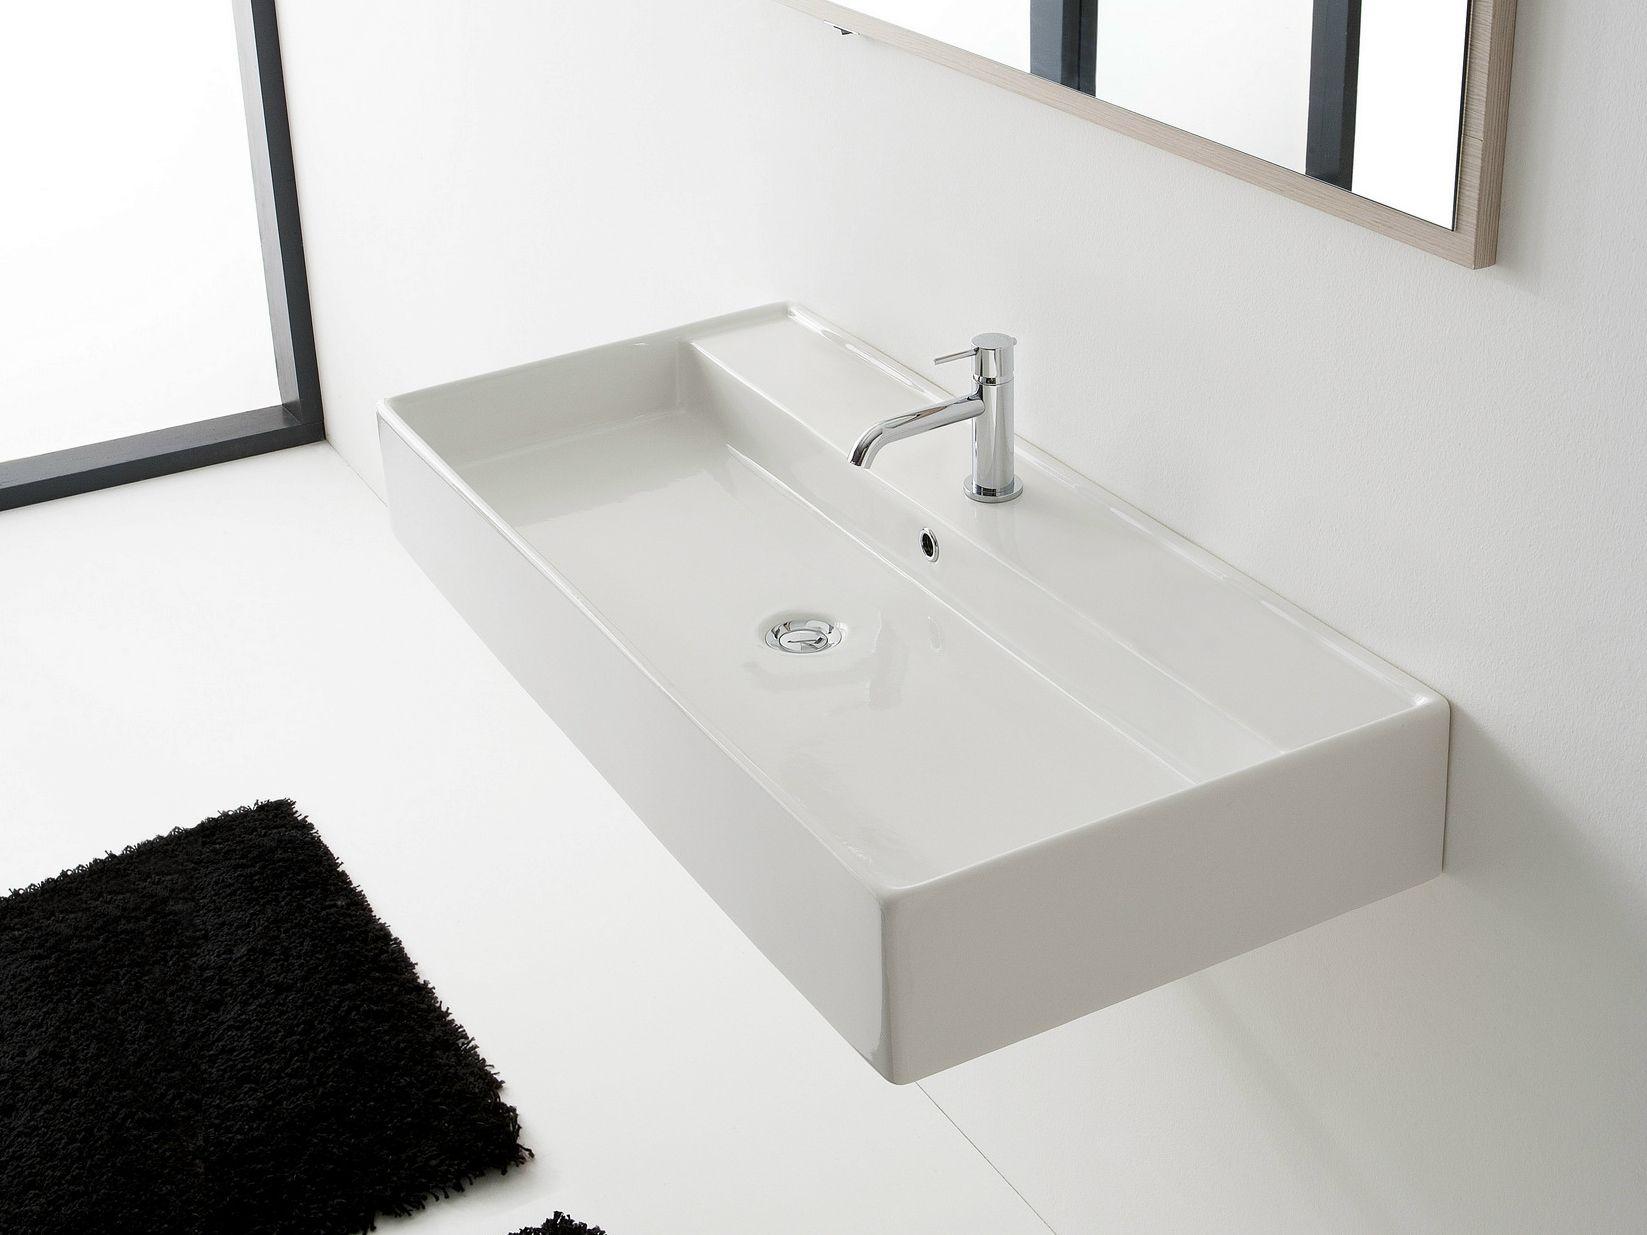 h nge waschbecken aus keramik teorema 120r a by scarabeo. Black Bedroom Furniture Sets. Home Design Ideas